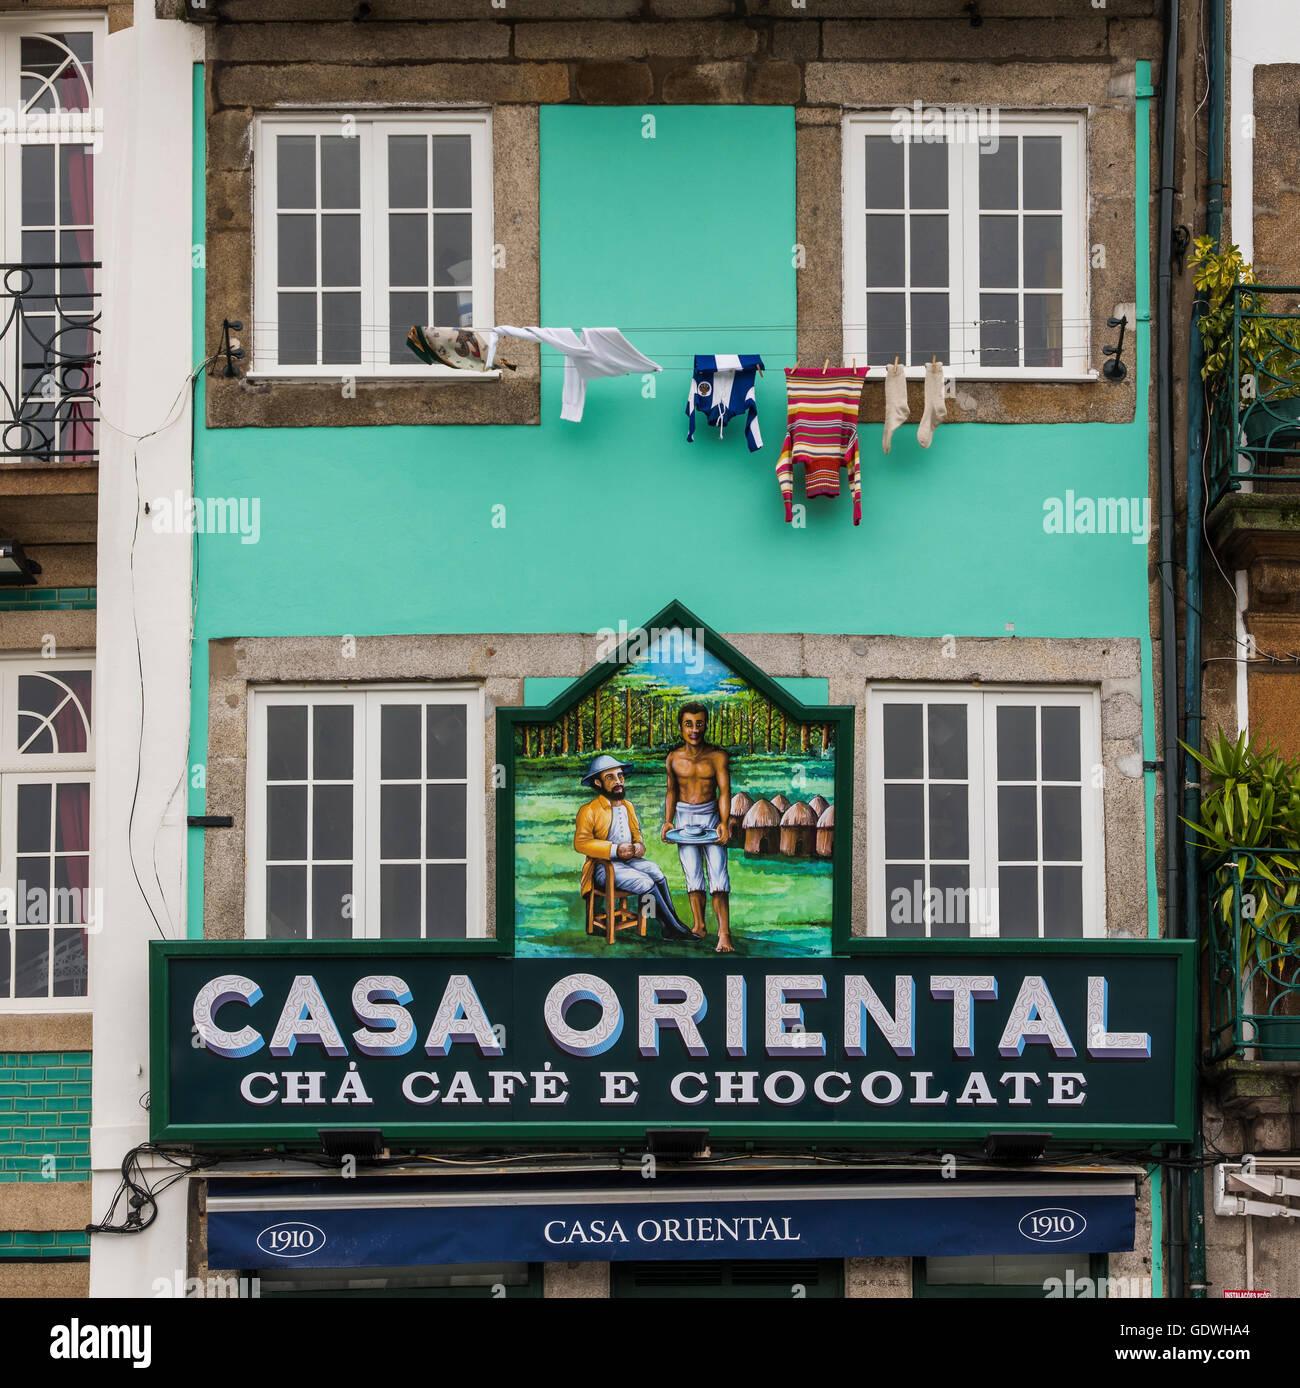 Casa Oriental Grocery Store, Porto, Portugal Stockbild